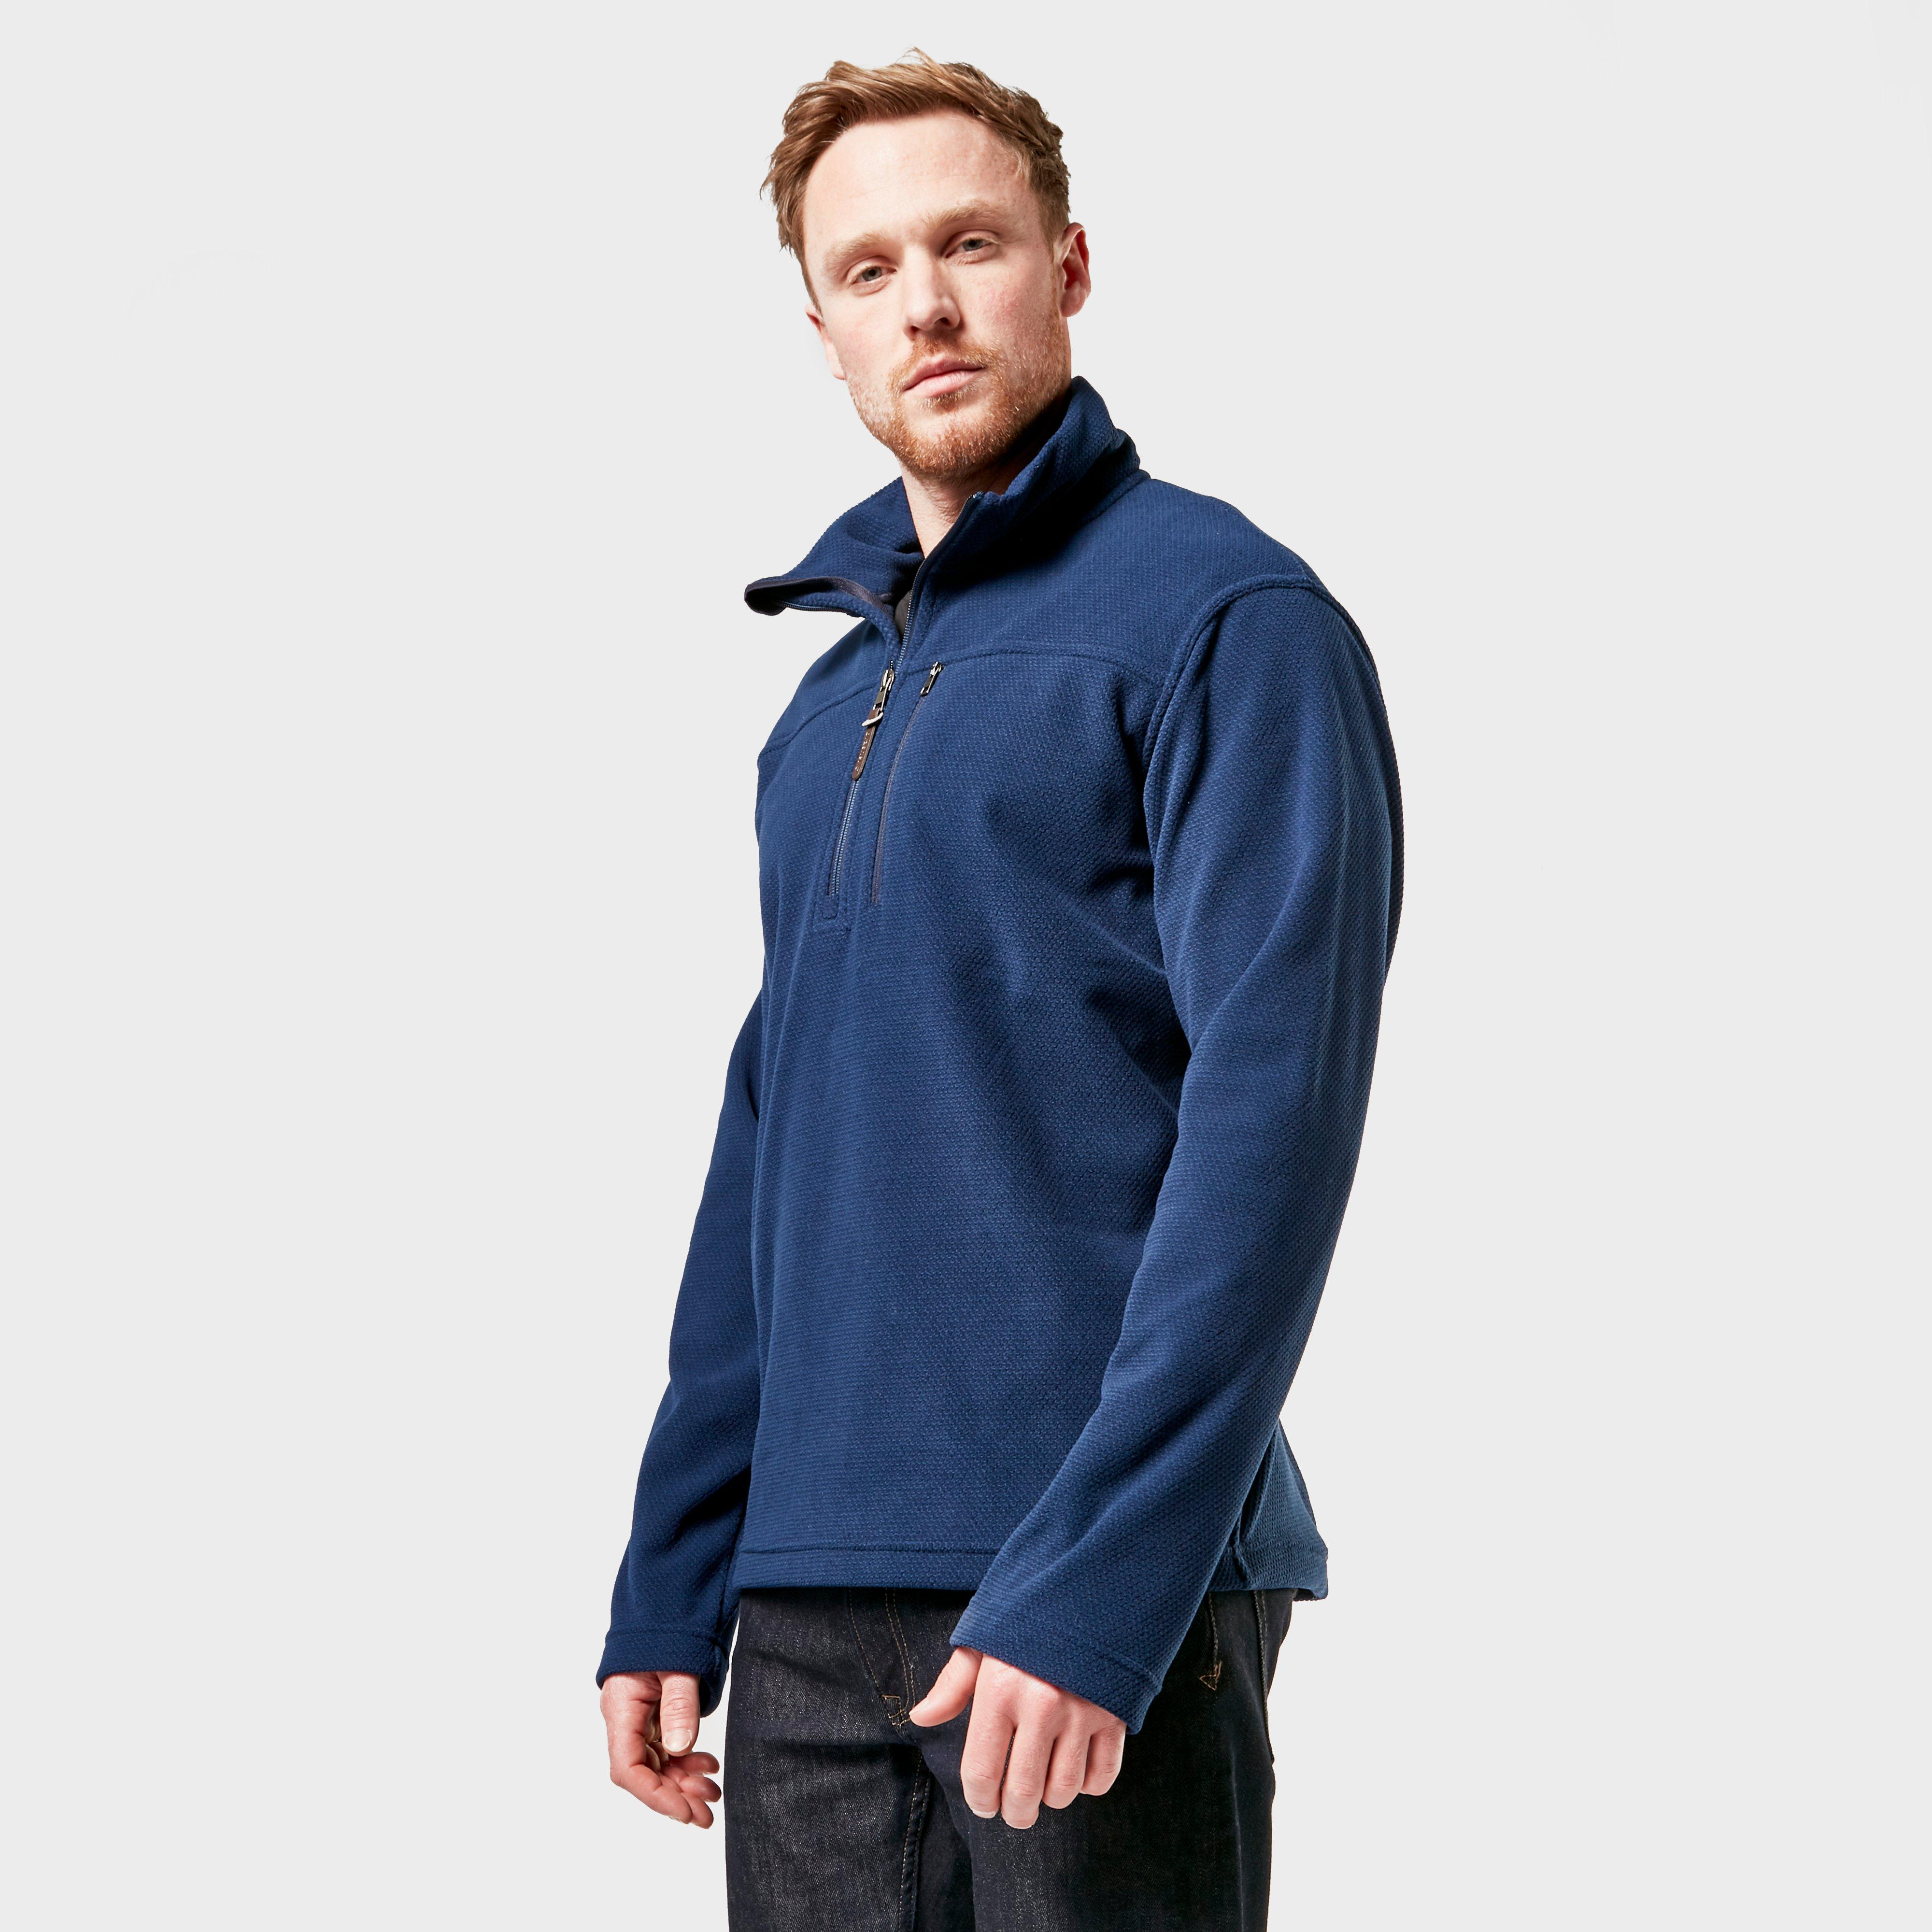 Brasher Mens Fountains Half Zip Fleece - Navy/nvy  Navy/nvy